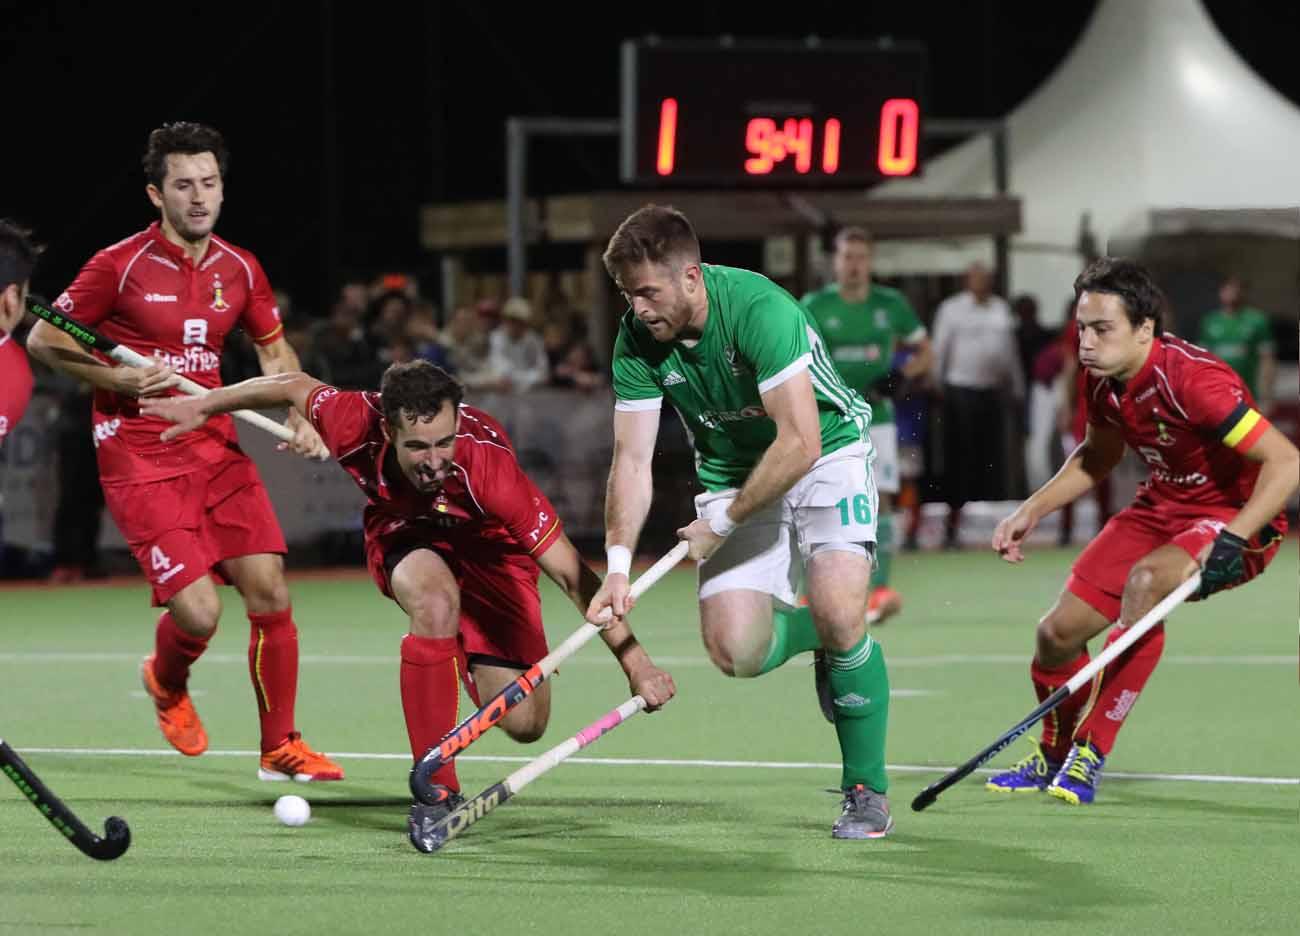 Les Red Lions impitoyables pour l'Irlande - Okey.be